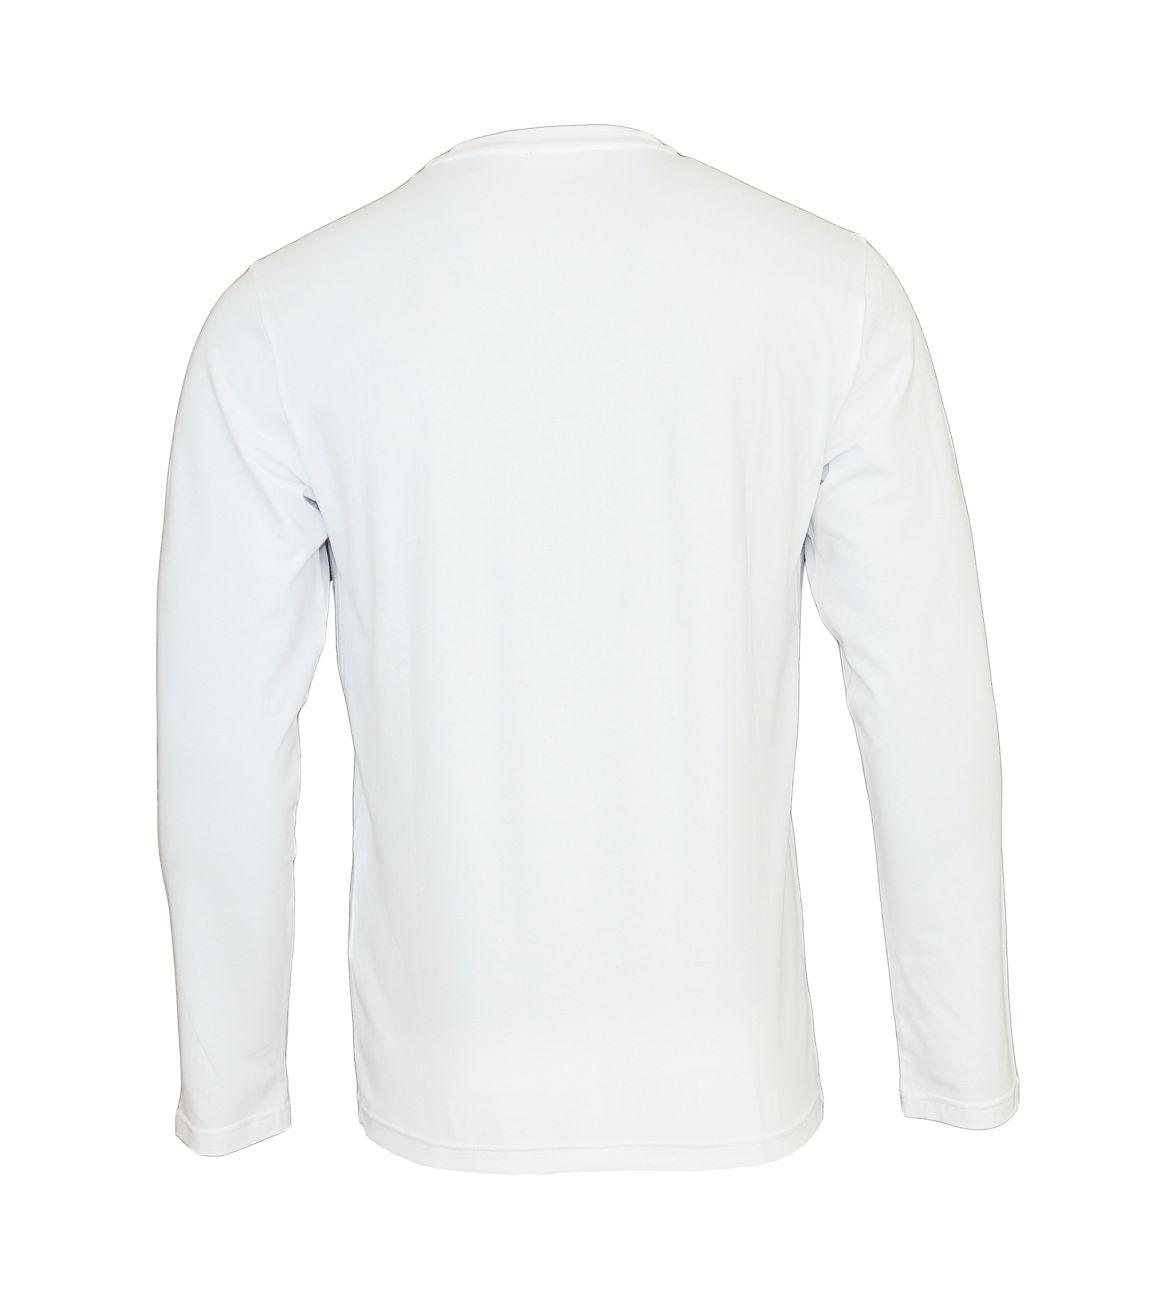 Emporio Armani Longsleeve Rundhals Shirt 111653 8A720 00010 BIANCO WX18-EAX